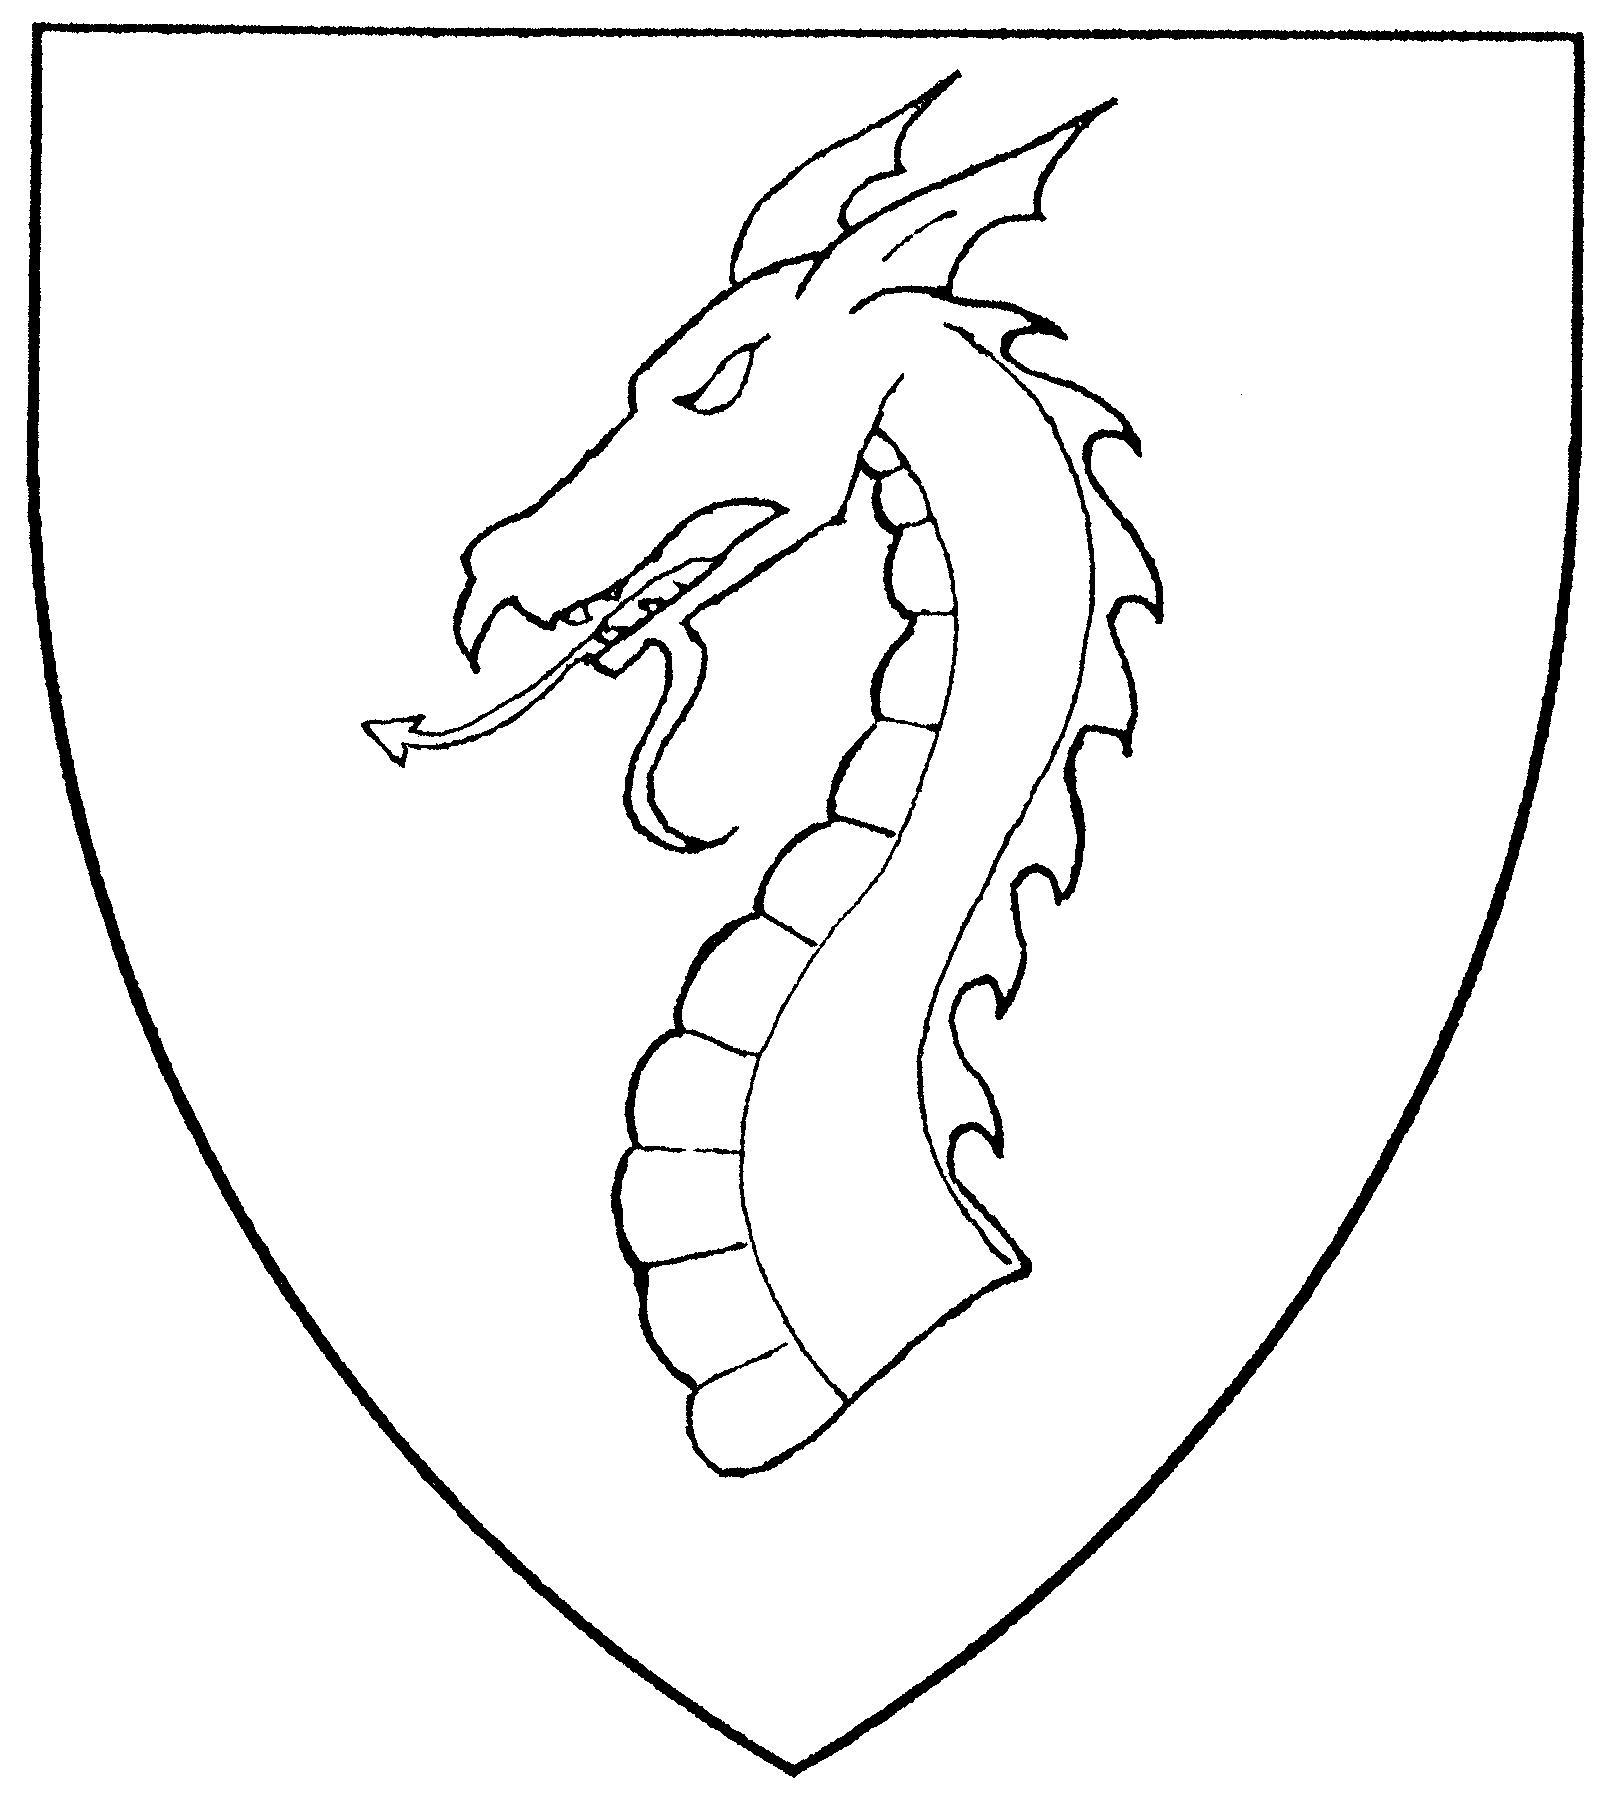 Dragon Heraldry: Dictionary Entries